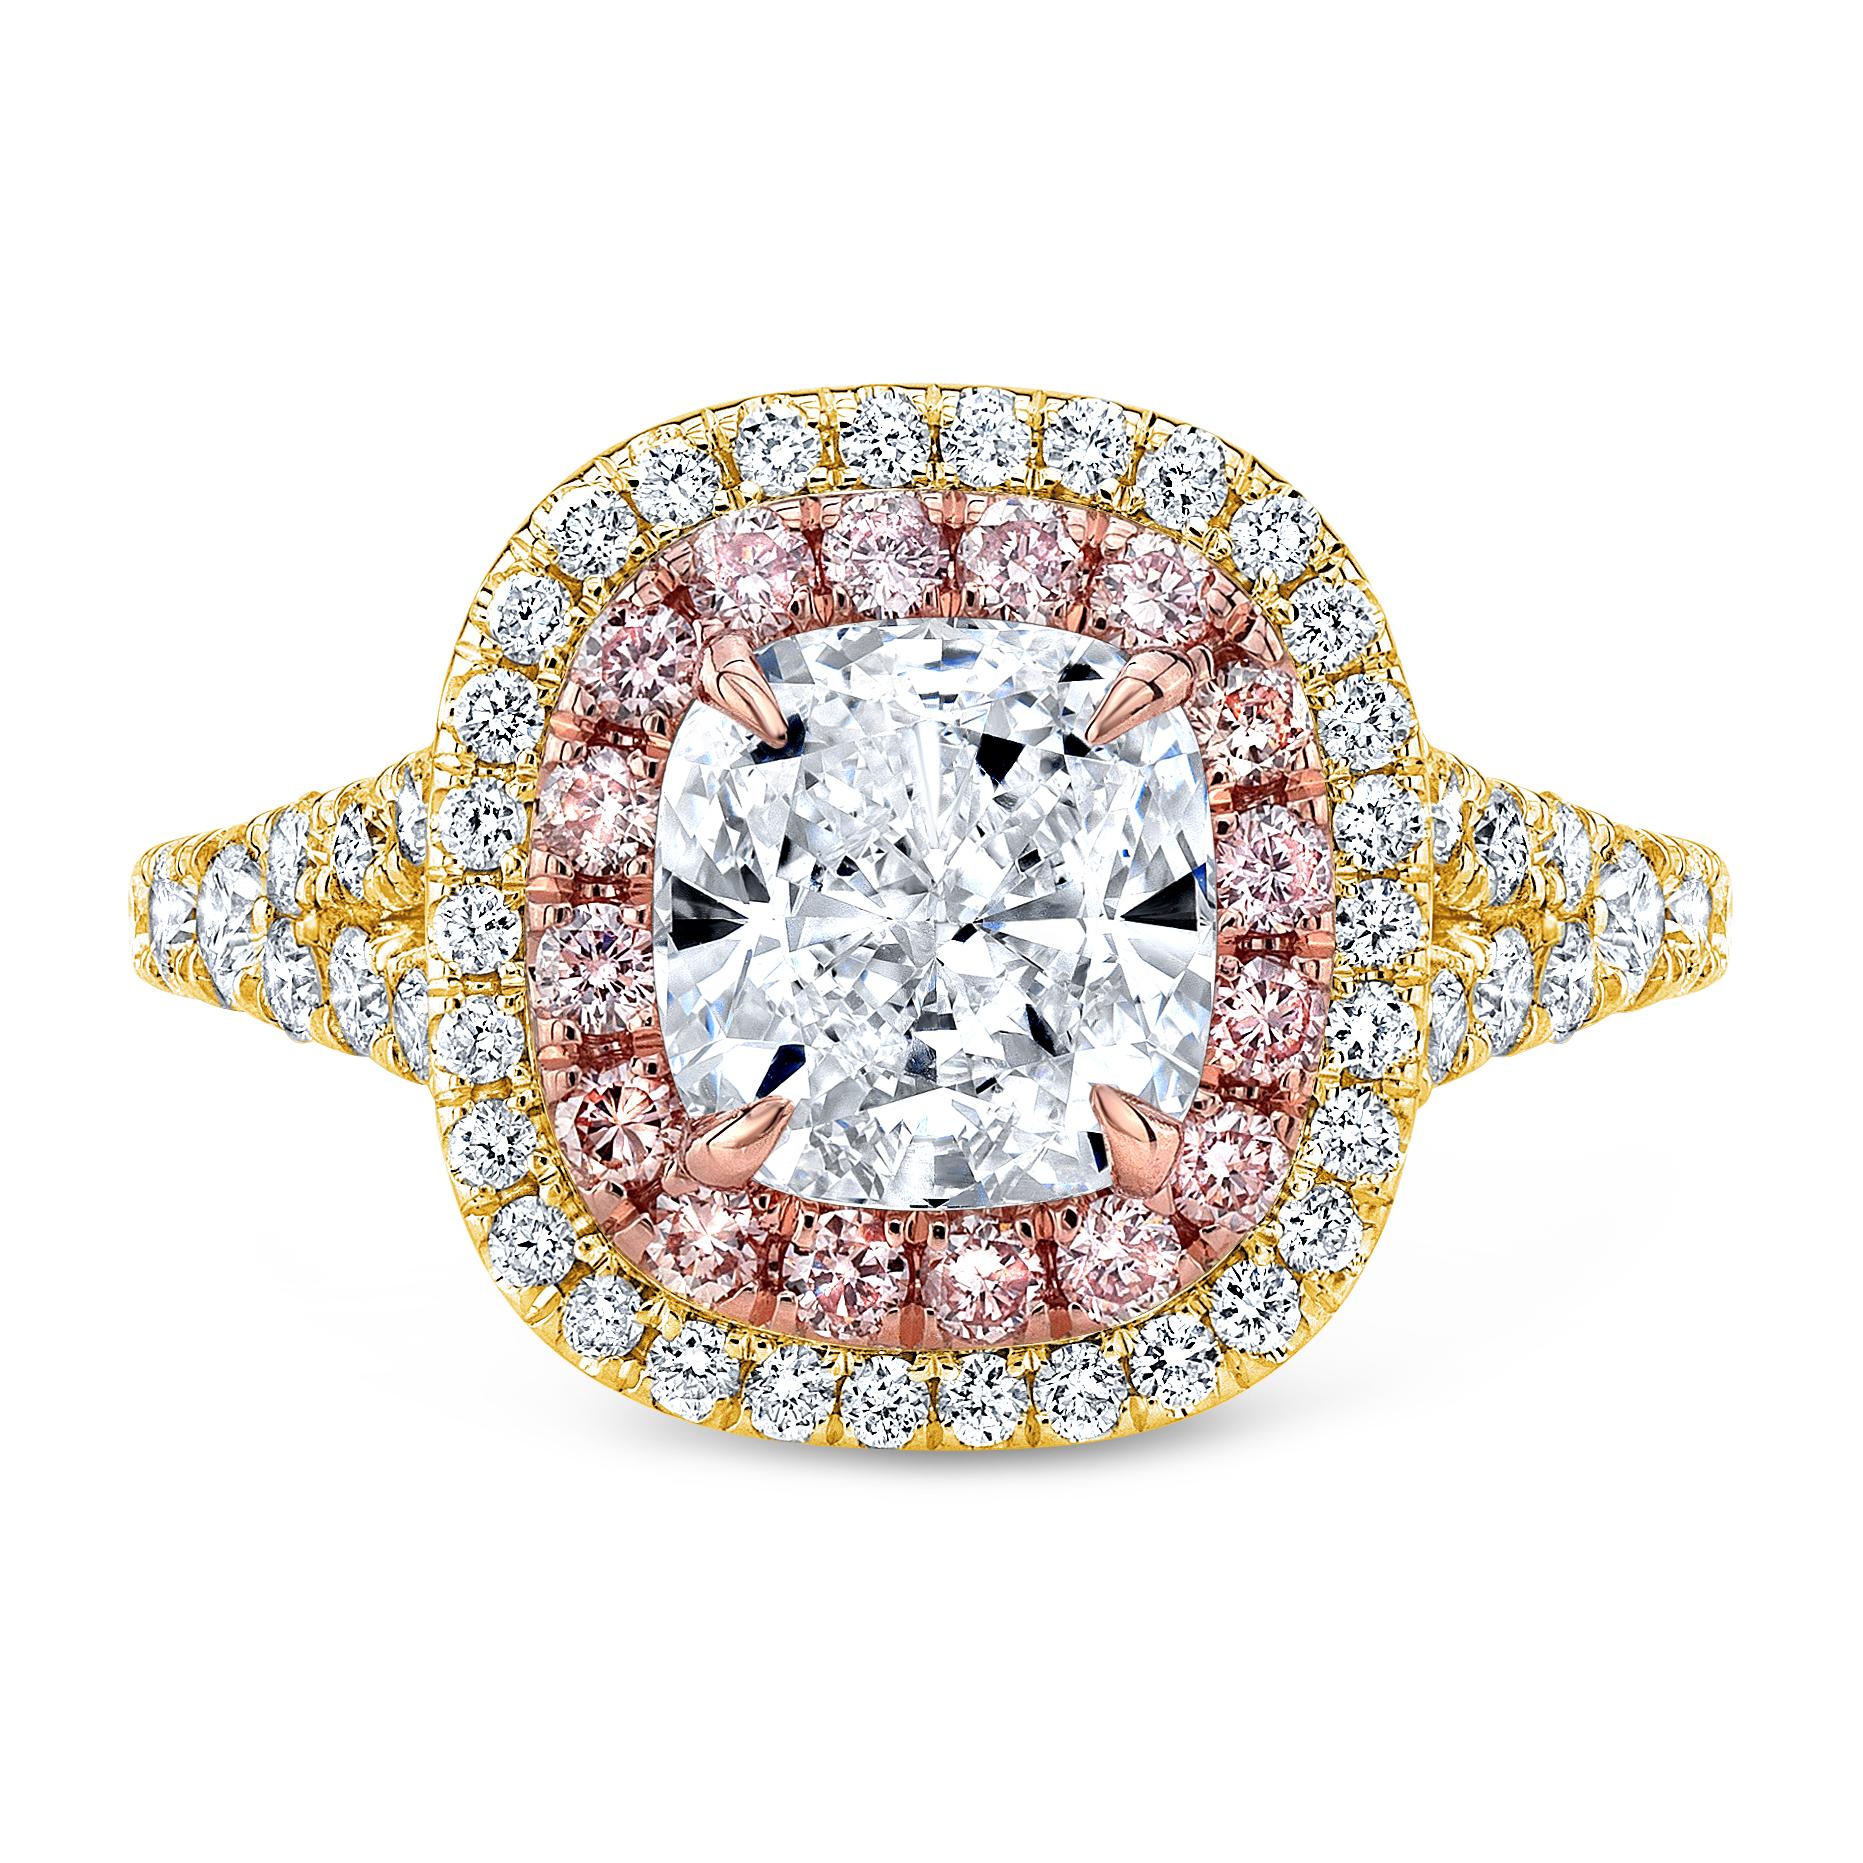 Double Halo Split Shank w/ Intense Pink Diamonds Engagement Ring